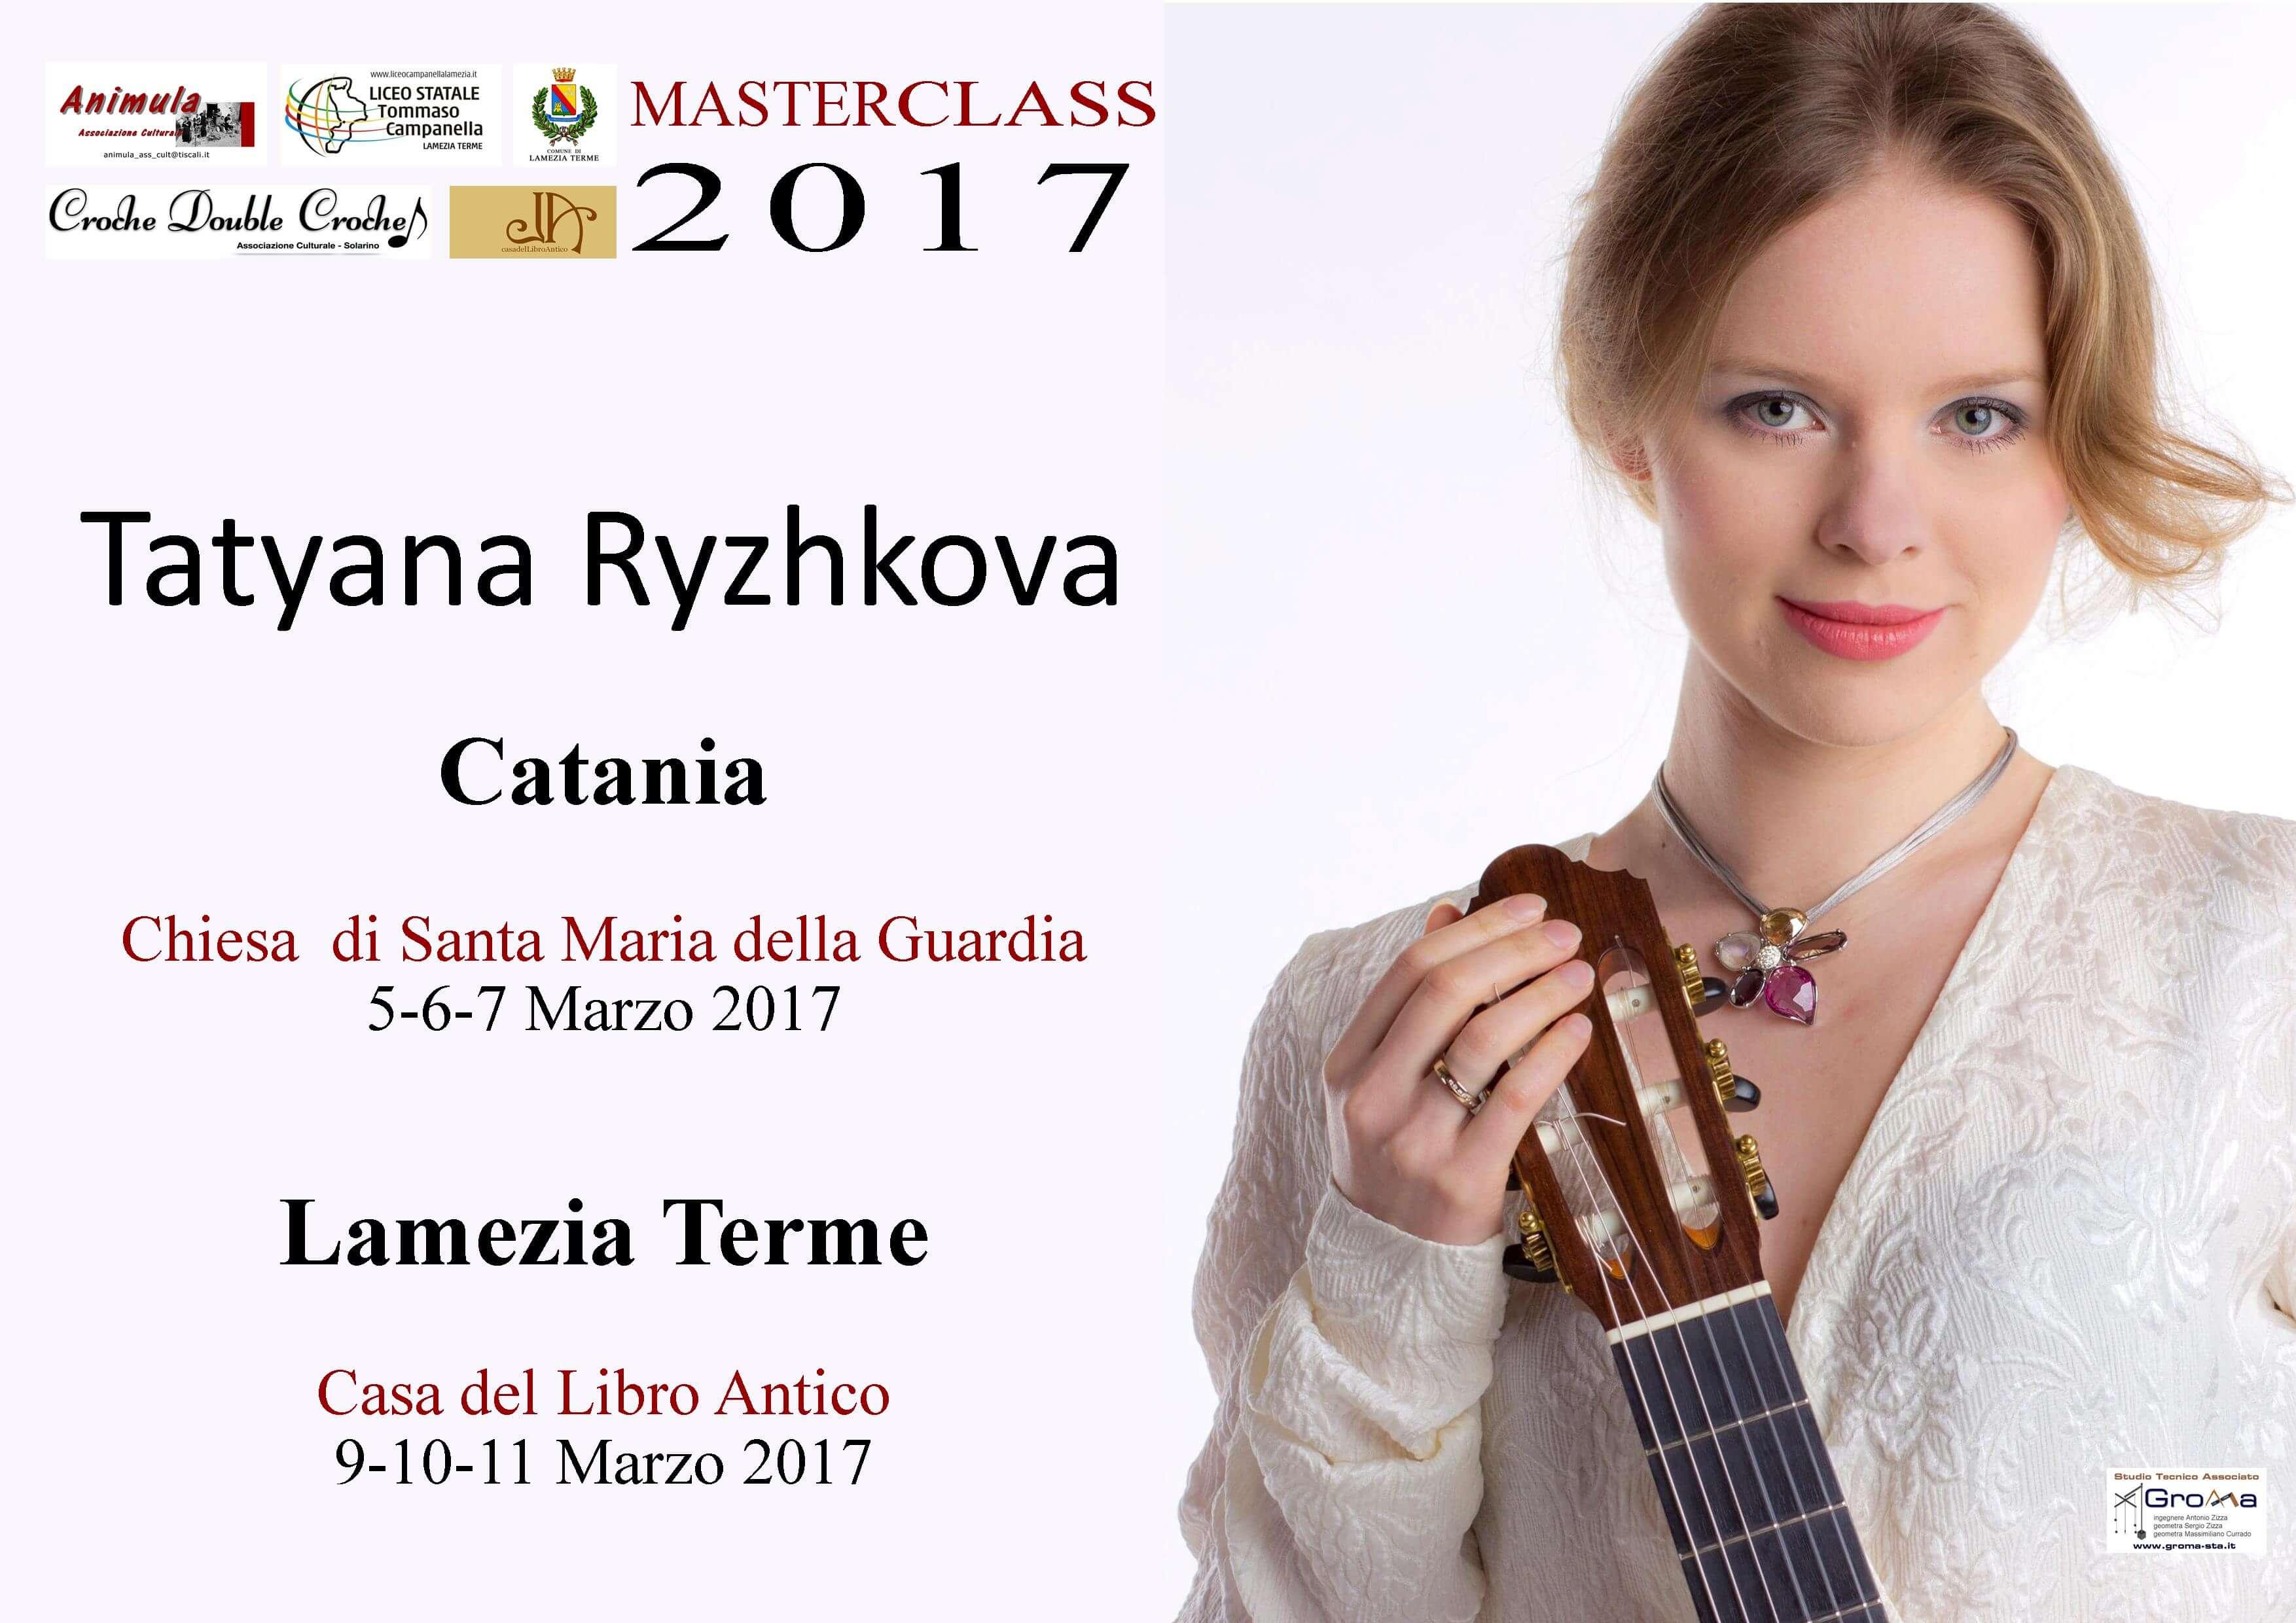 Masterclass Tatyana Ryzhkova